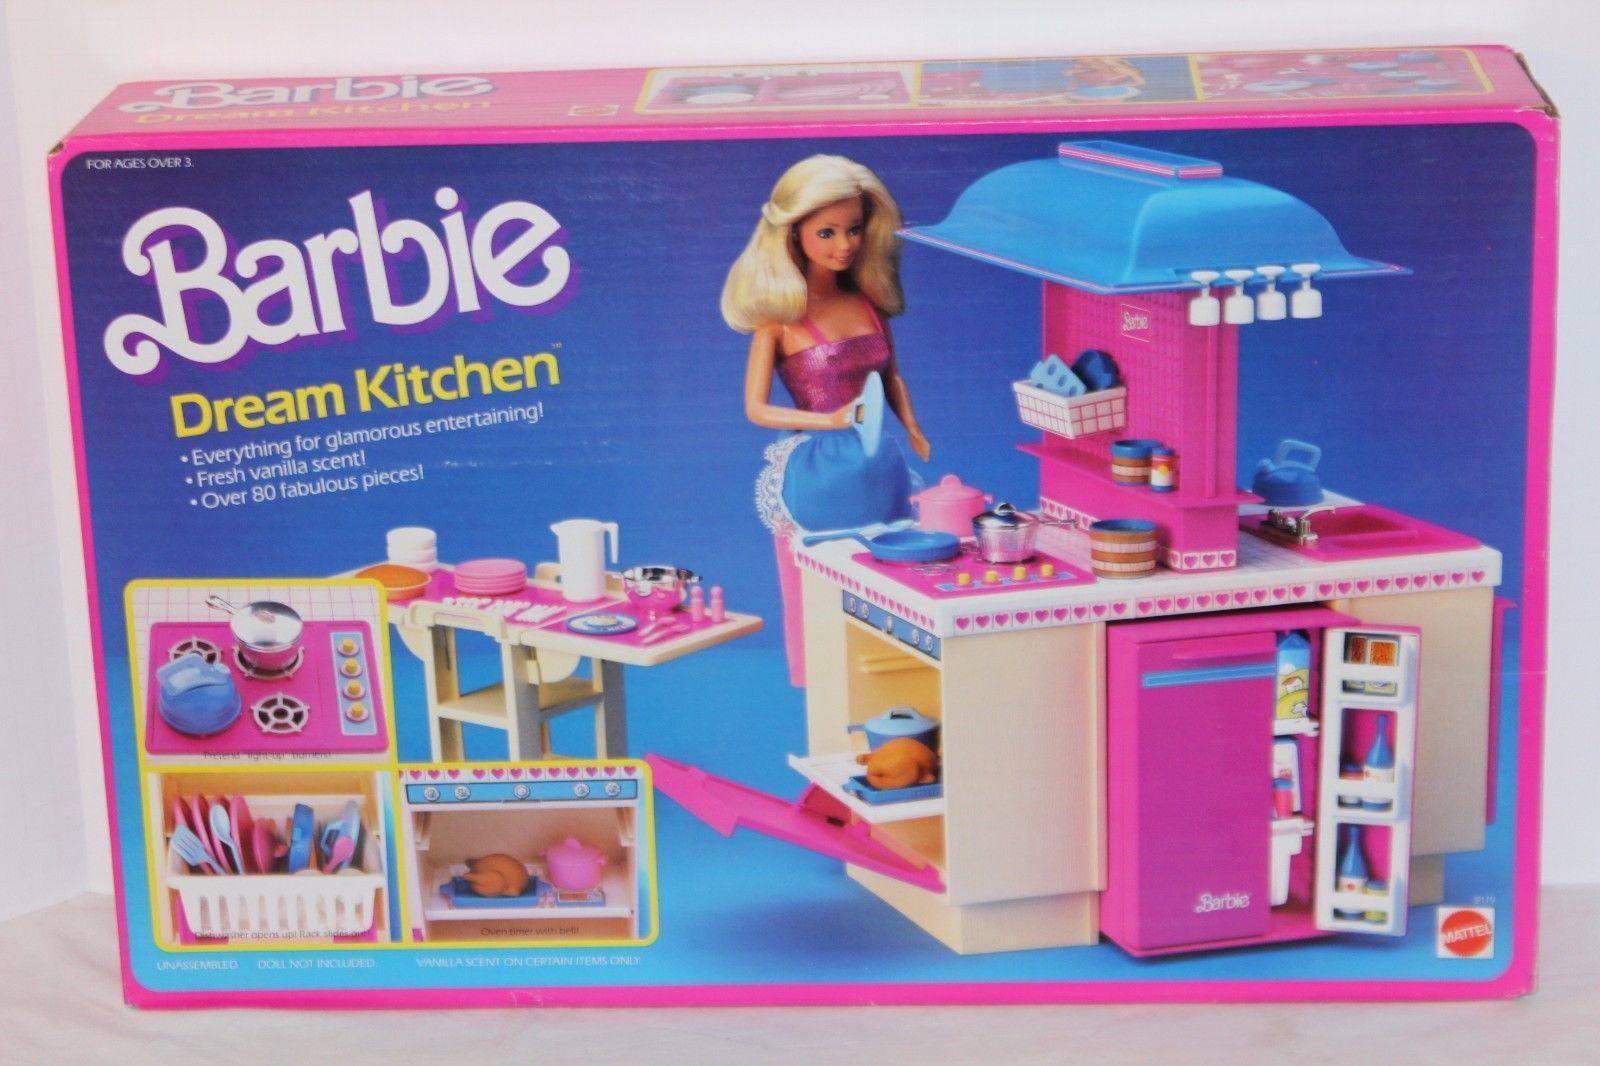 Barbie Dream Kitchen Design For Home